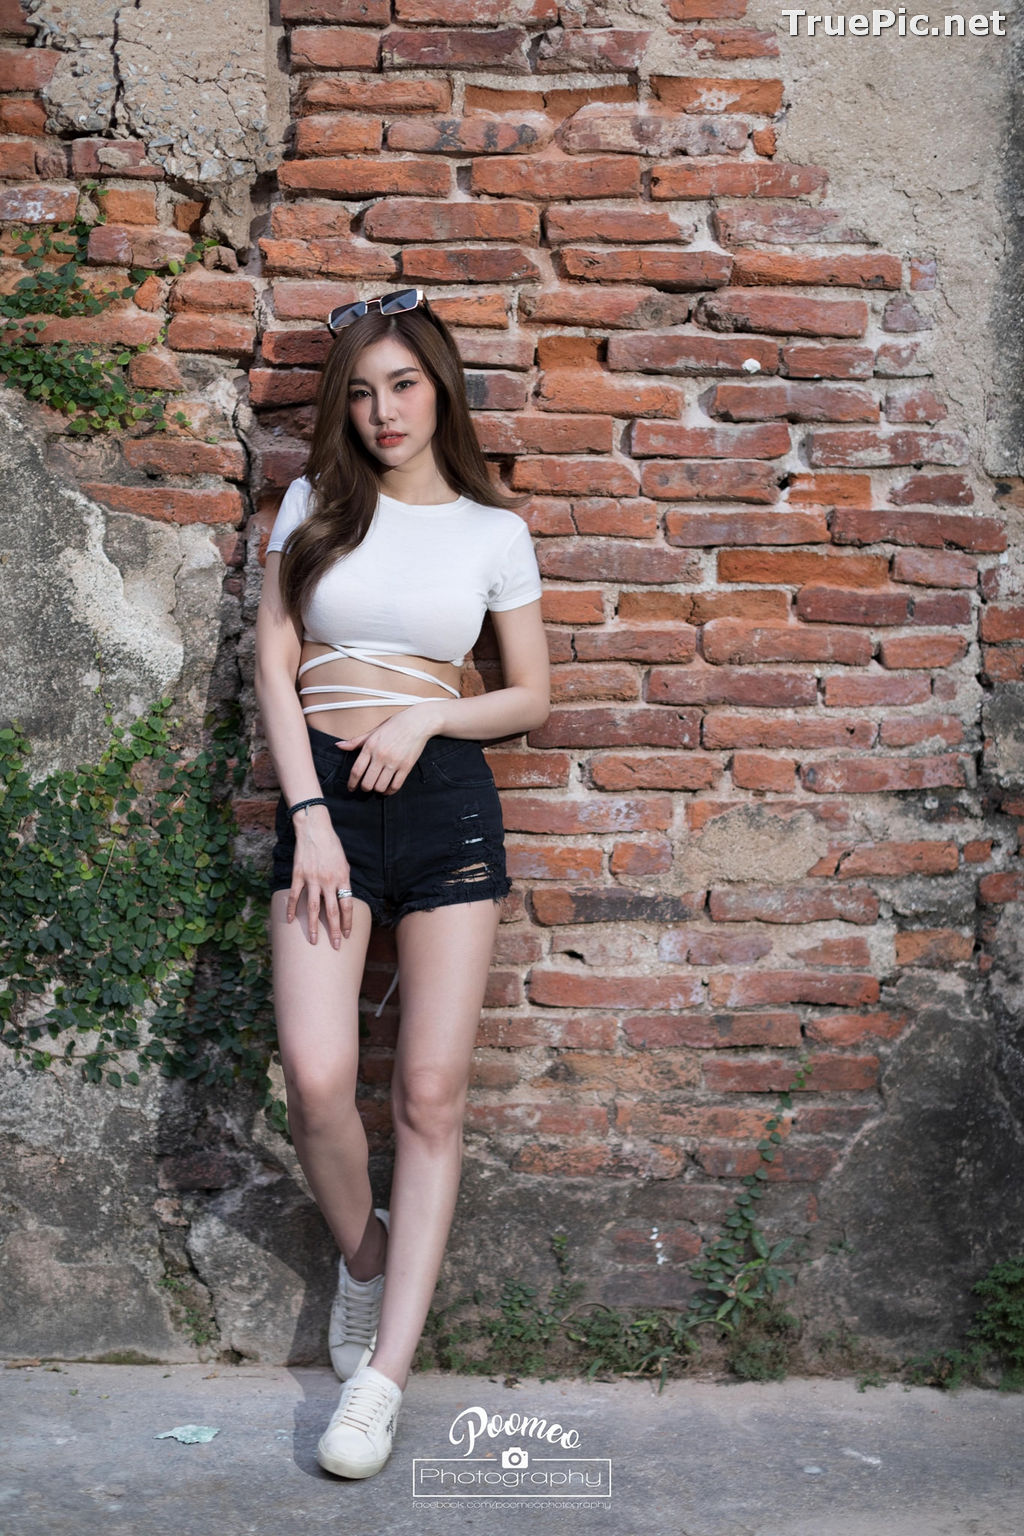 Image Thailand Model - Jarunan Tavepanya - Hot Beautiful Girl On Street - TruePic.net - Picture-6